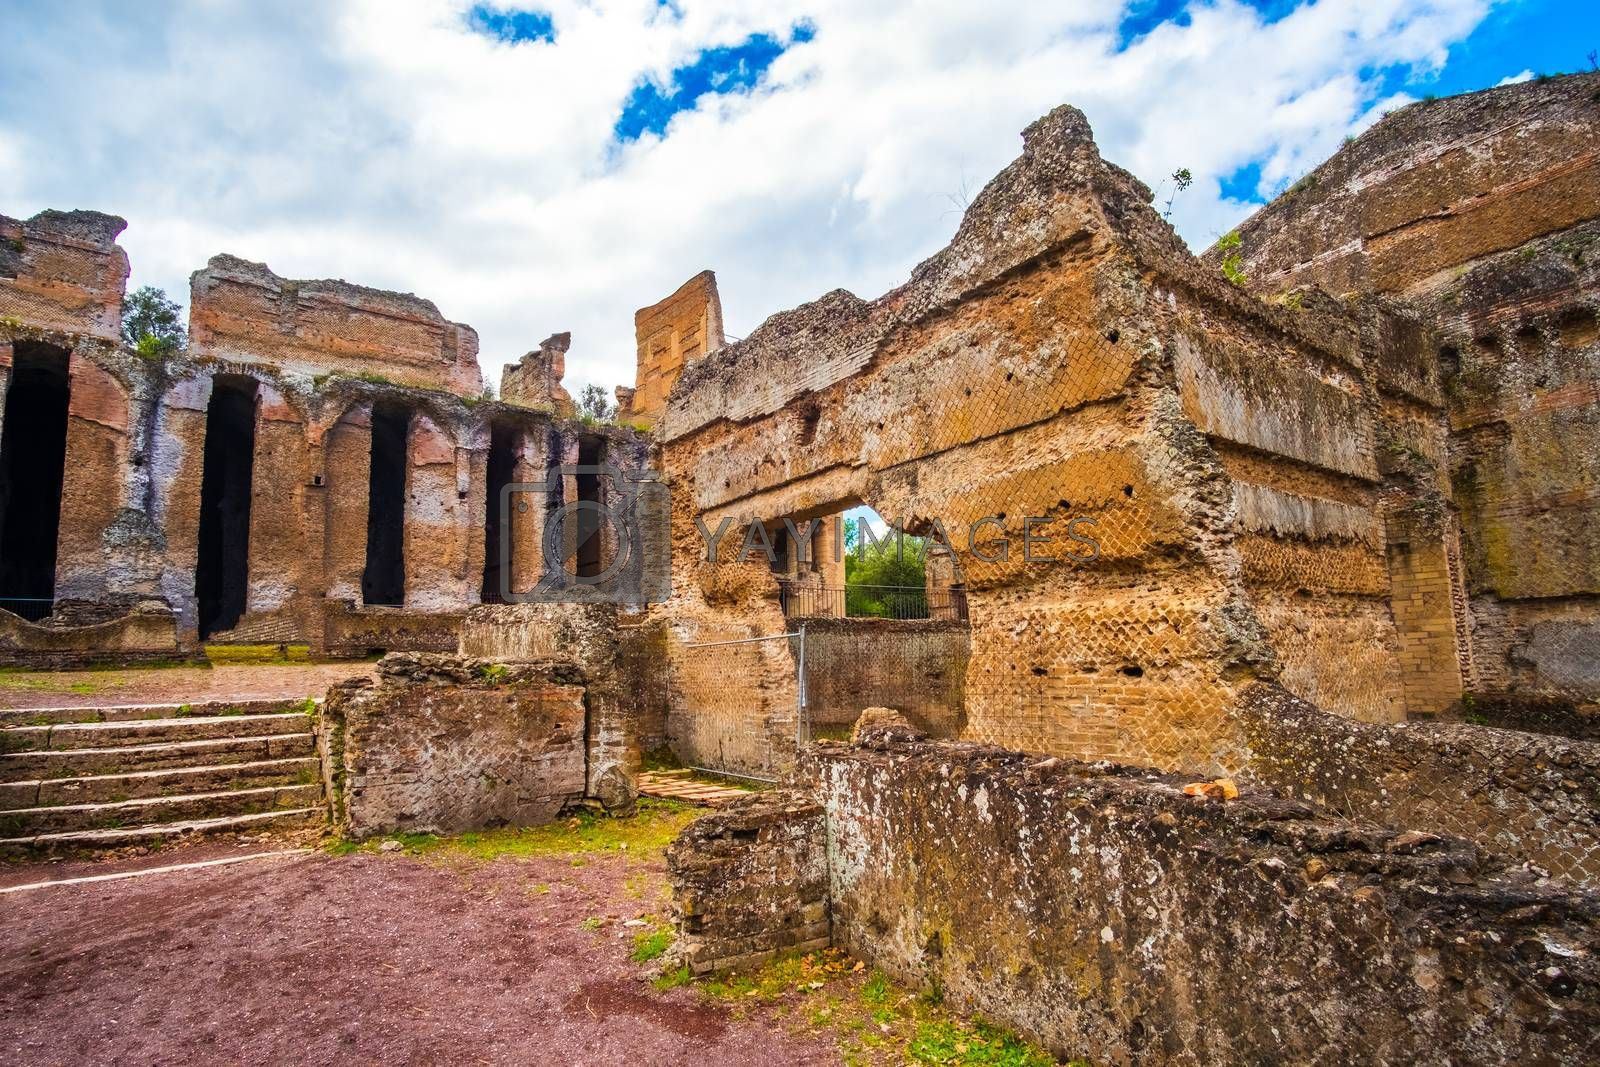 Tivoli - Villa Adriana in Rome - archaeological landmark in Italy .